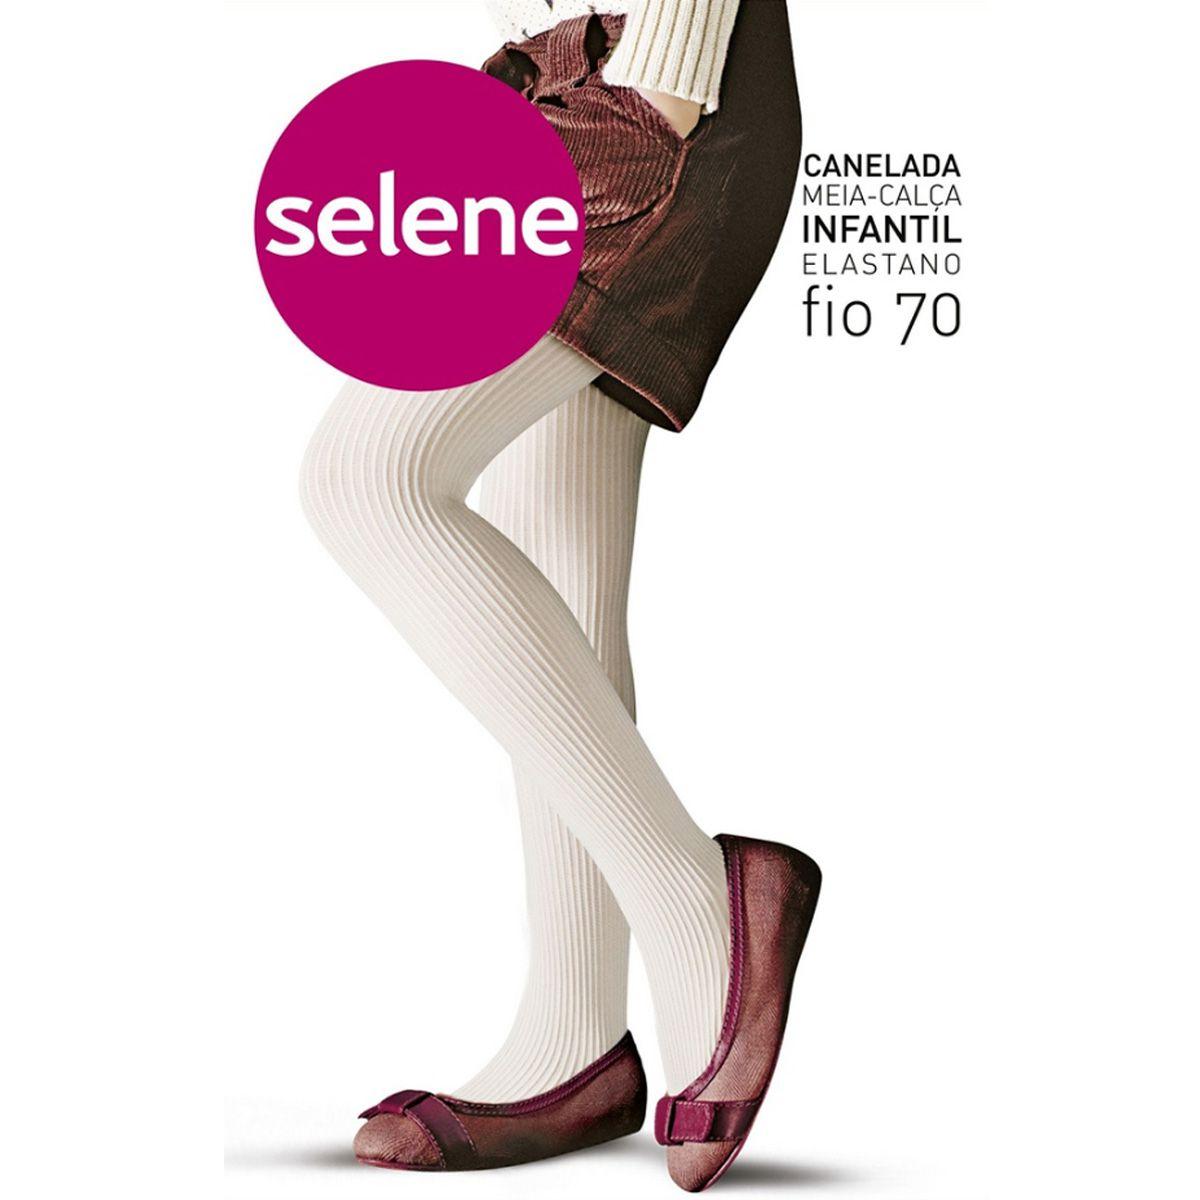 Meia calça infantil fio 70 Selene